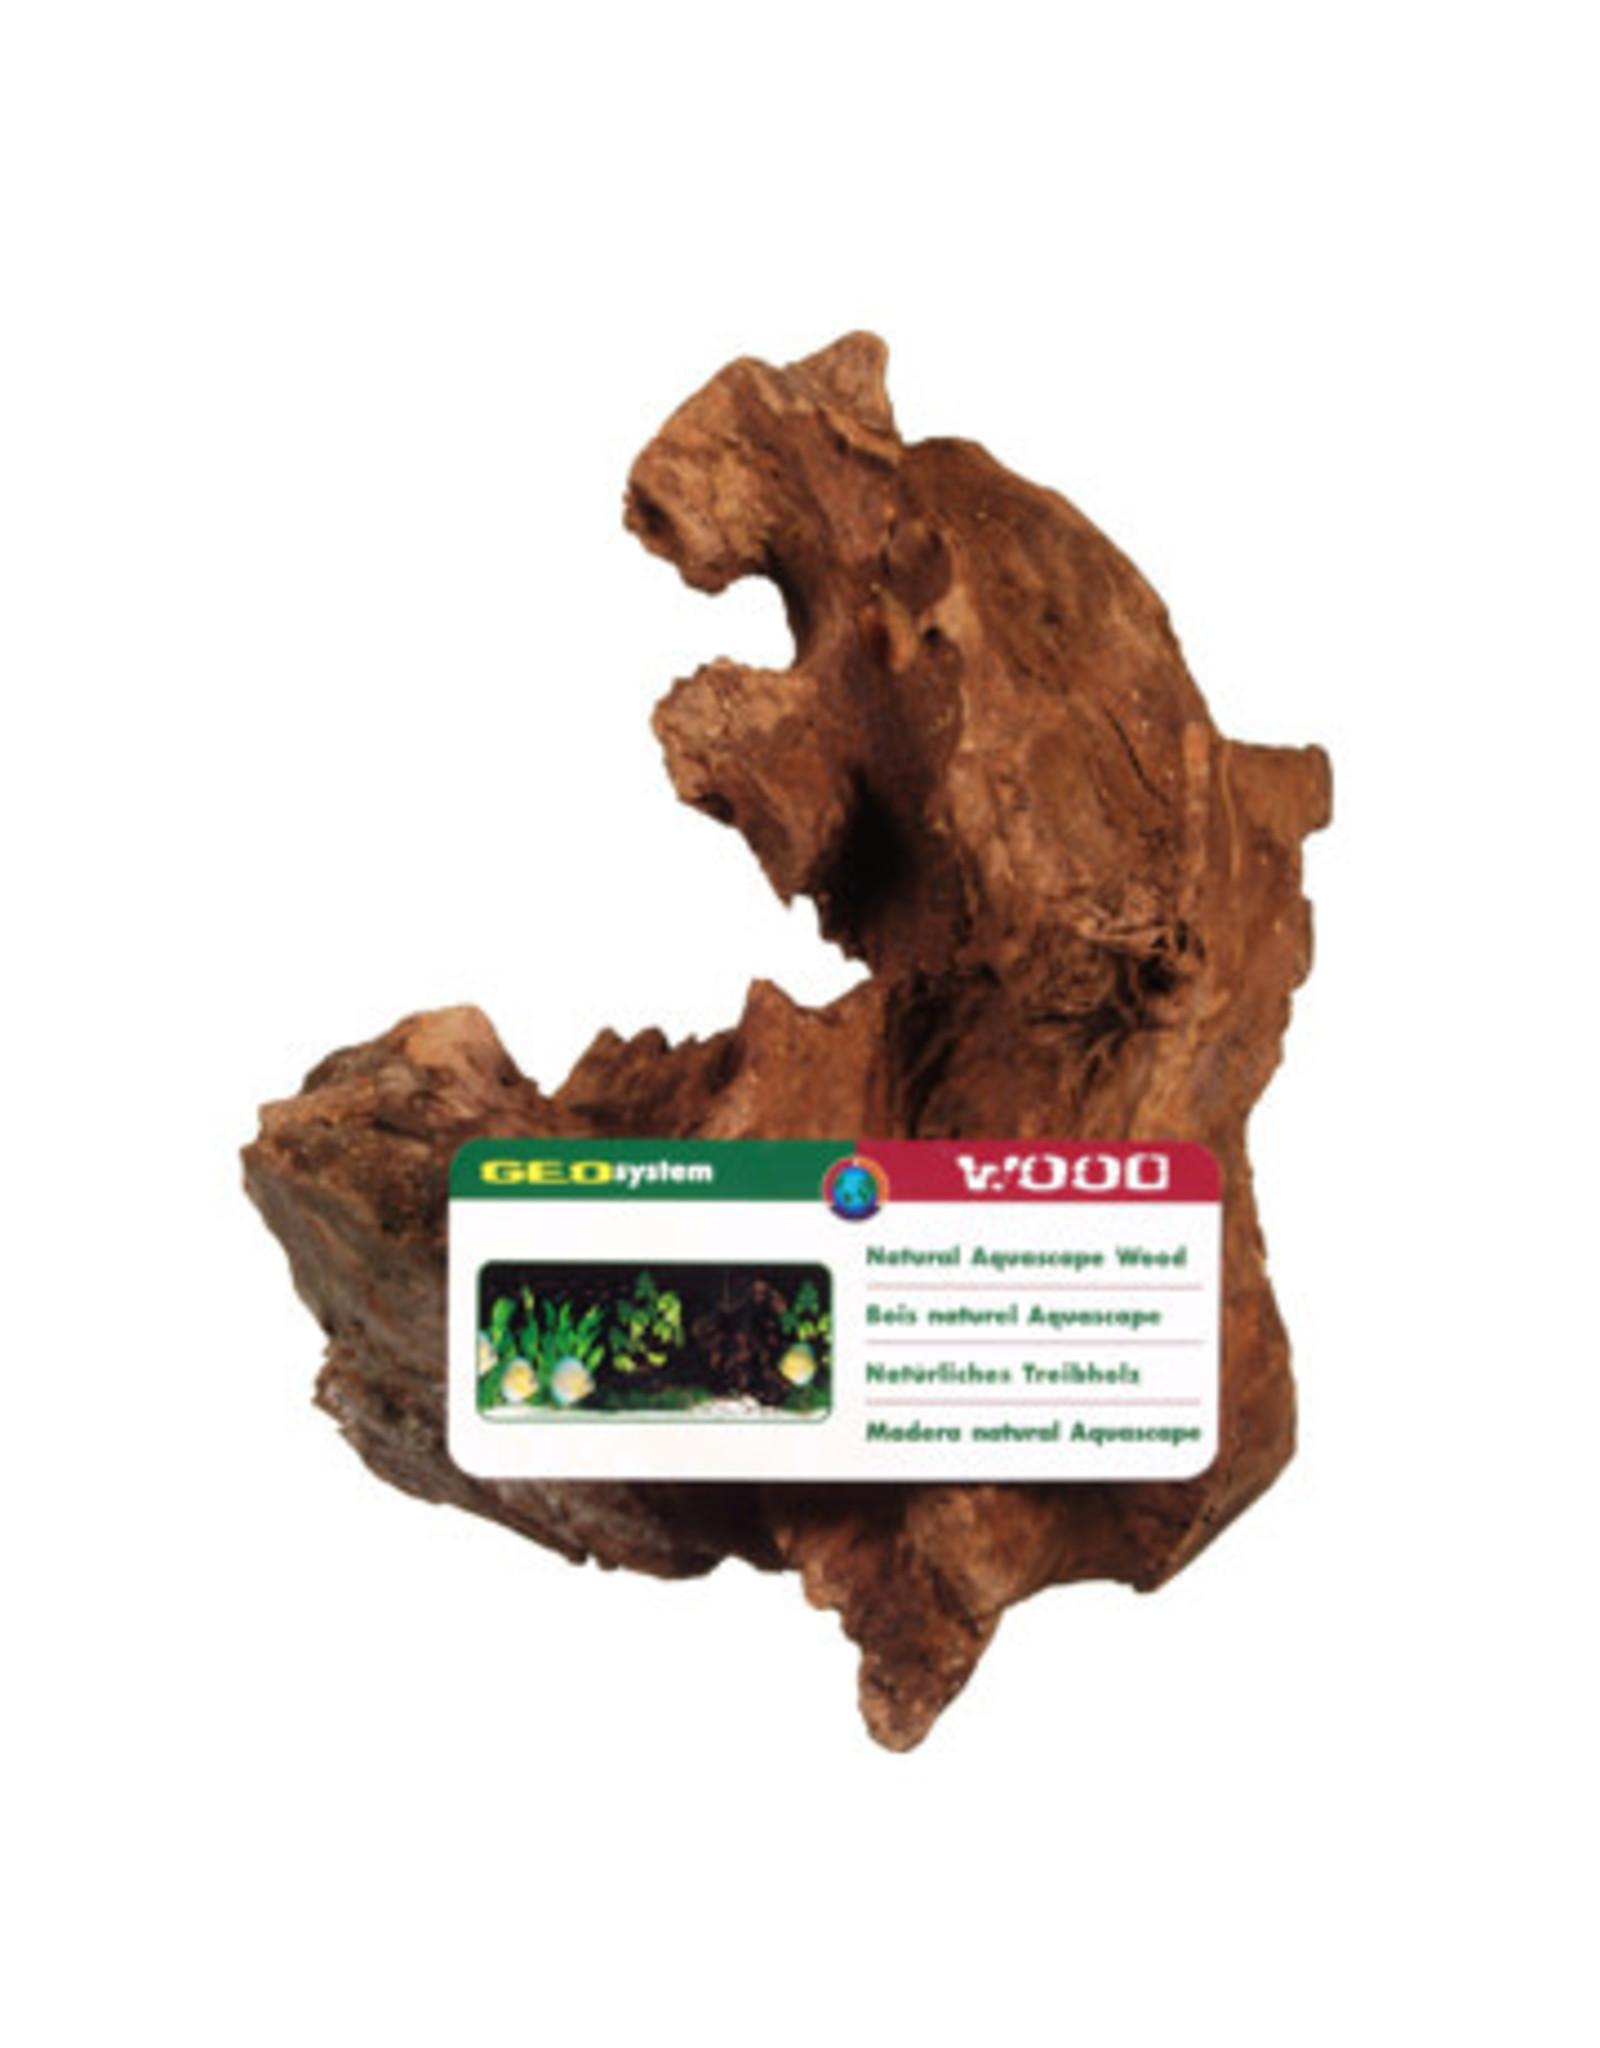 Geosystem Malaysian Root Wood, Medium